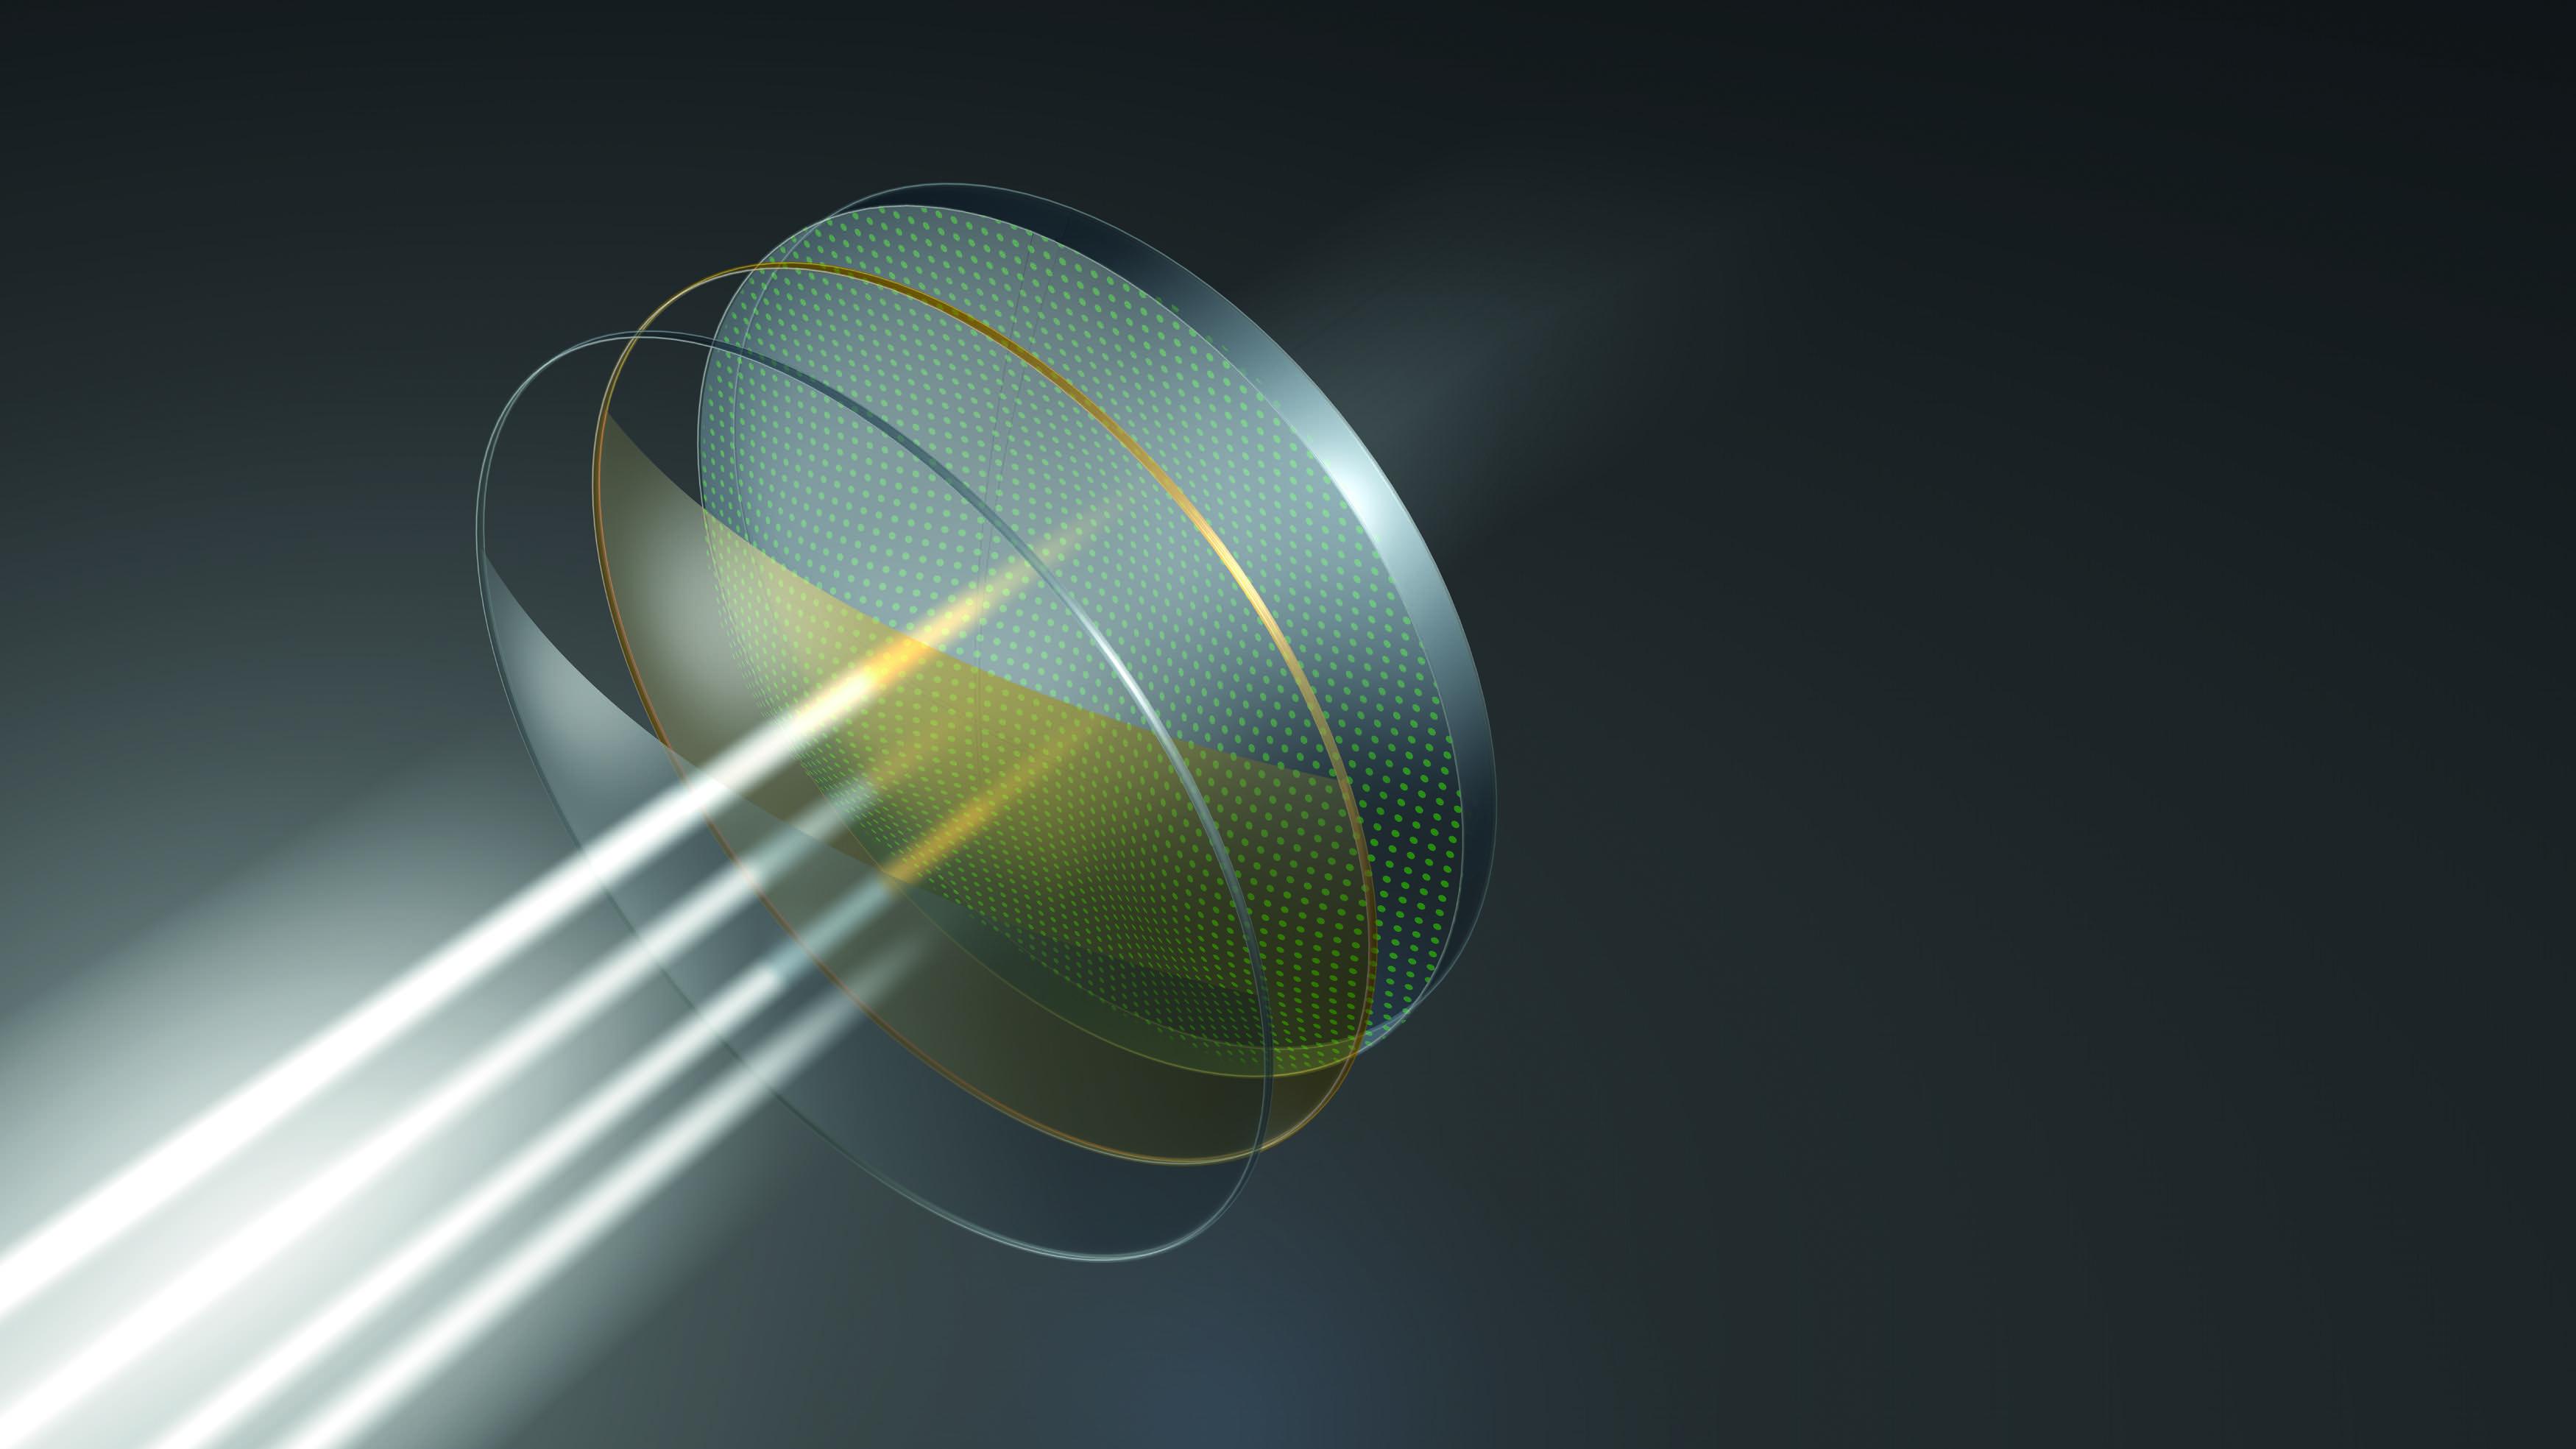 10-11_enroute-exploded-view-illustration-hr-25cm_mod_cmyk